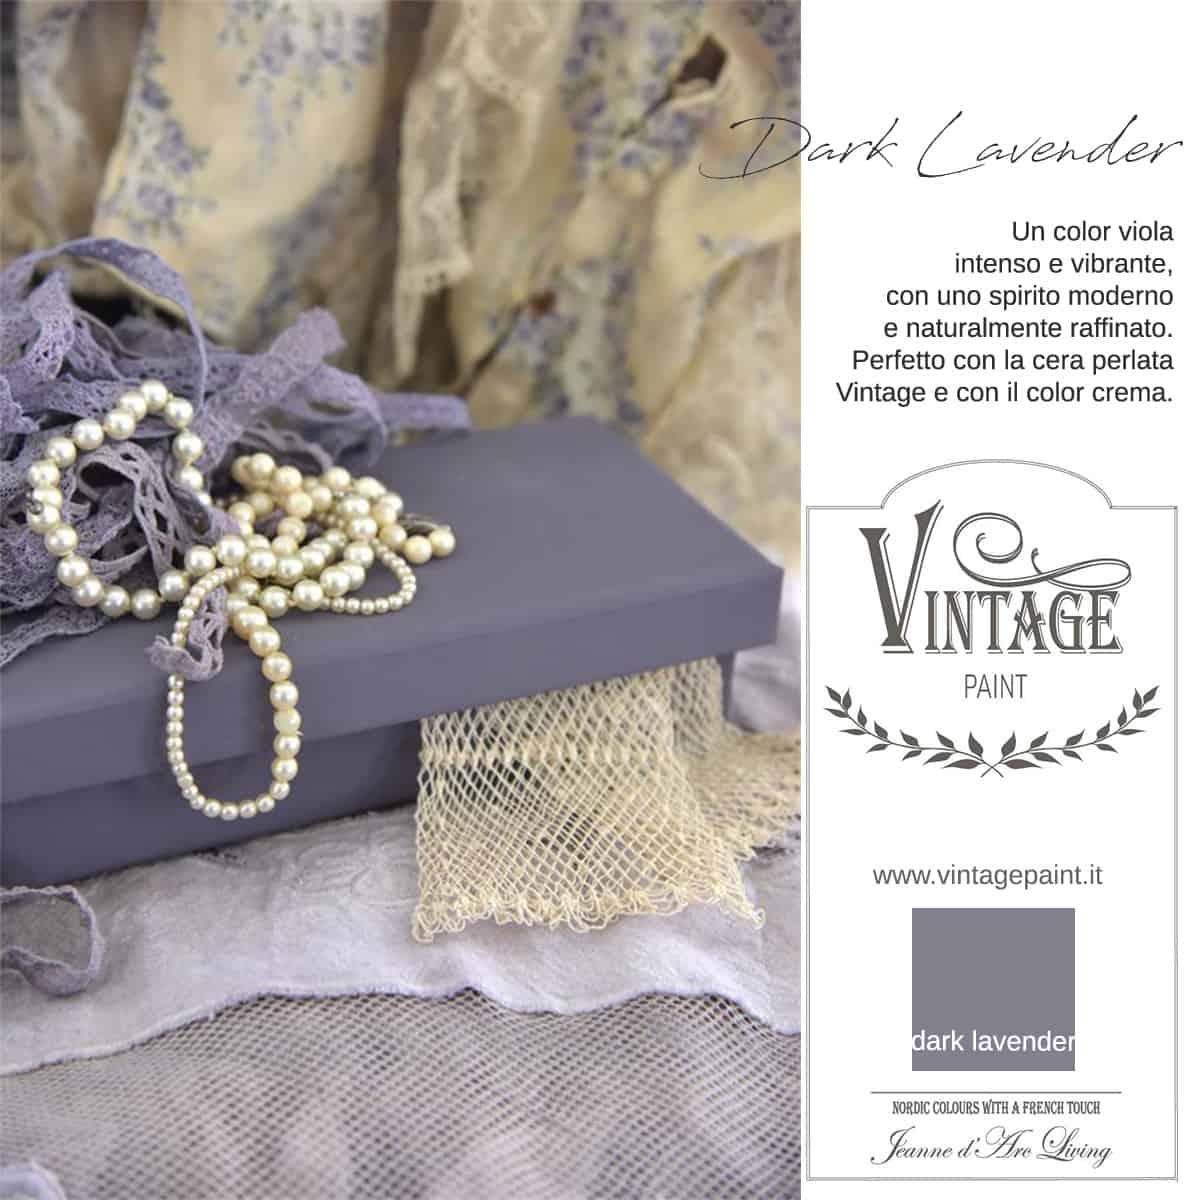 dark lavender viola vintage chalk paint vernici shabby chic autentico look gesso